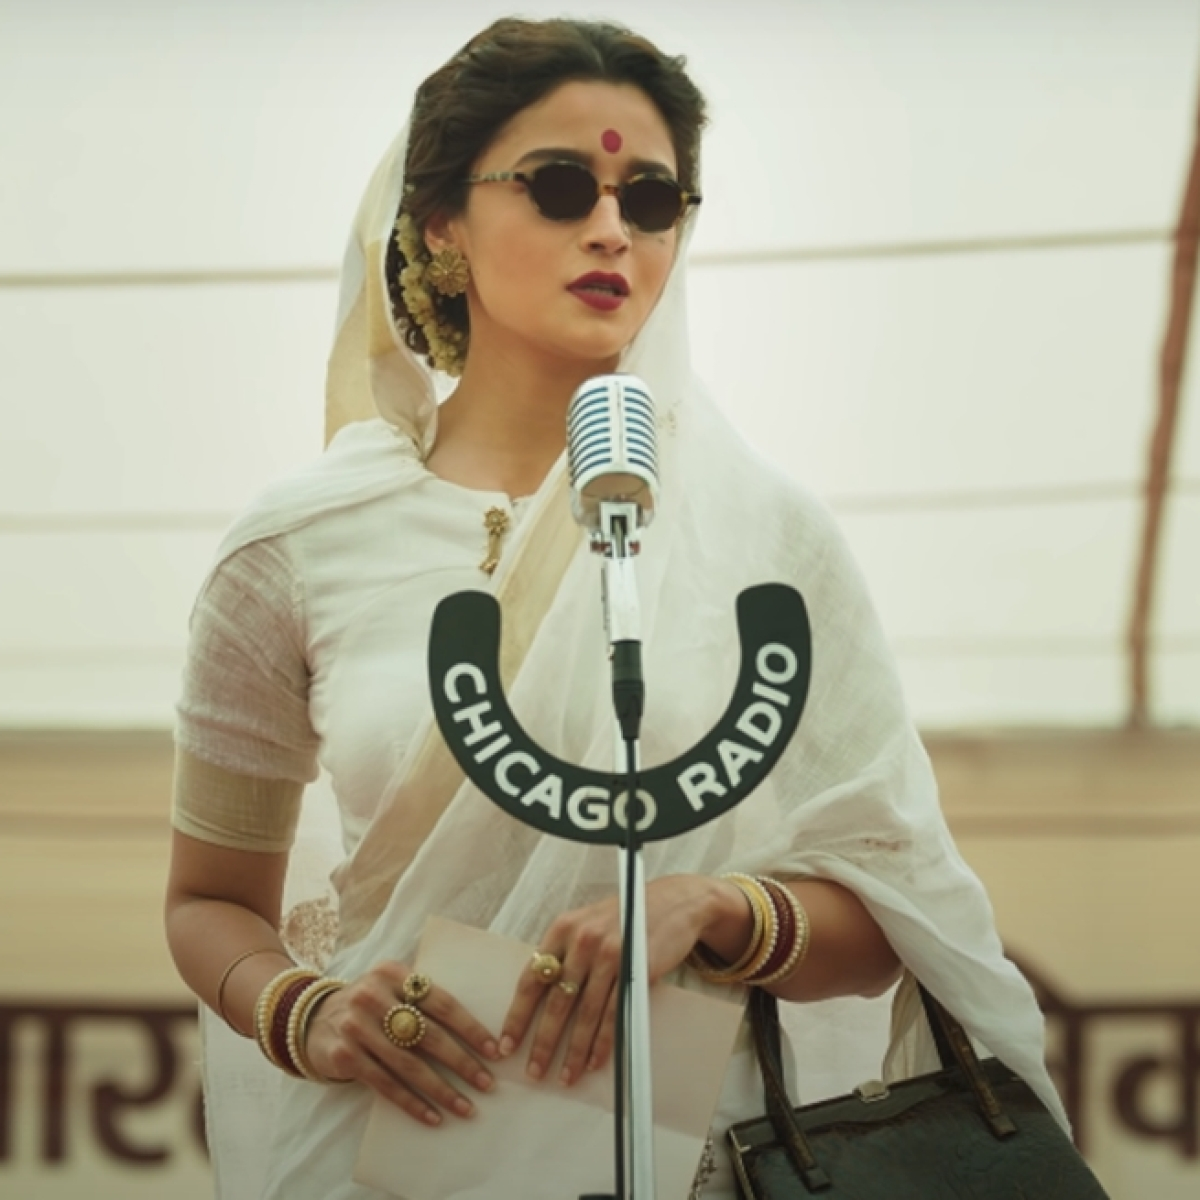 'Will you make me Mrs Nehru?': When Gangubai Kathiawadi asked PM Nehru to marry her